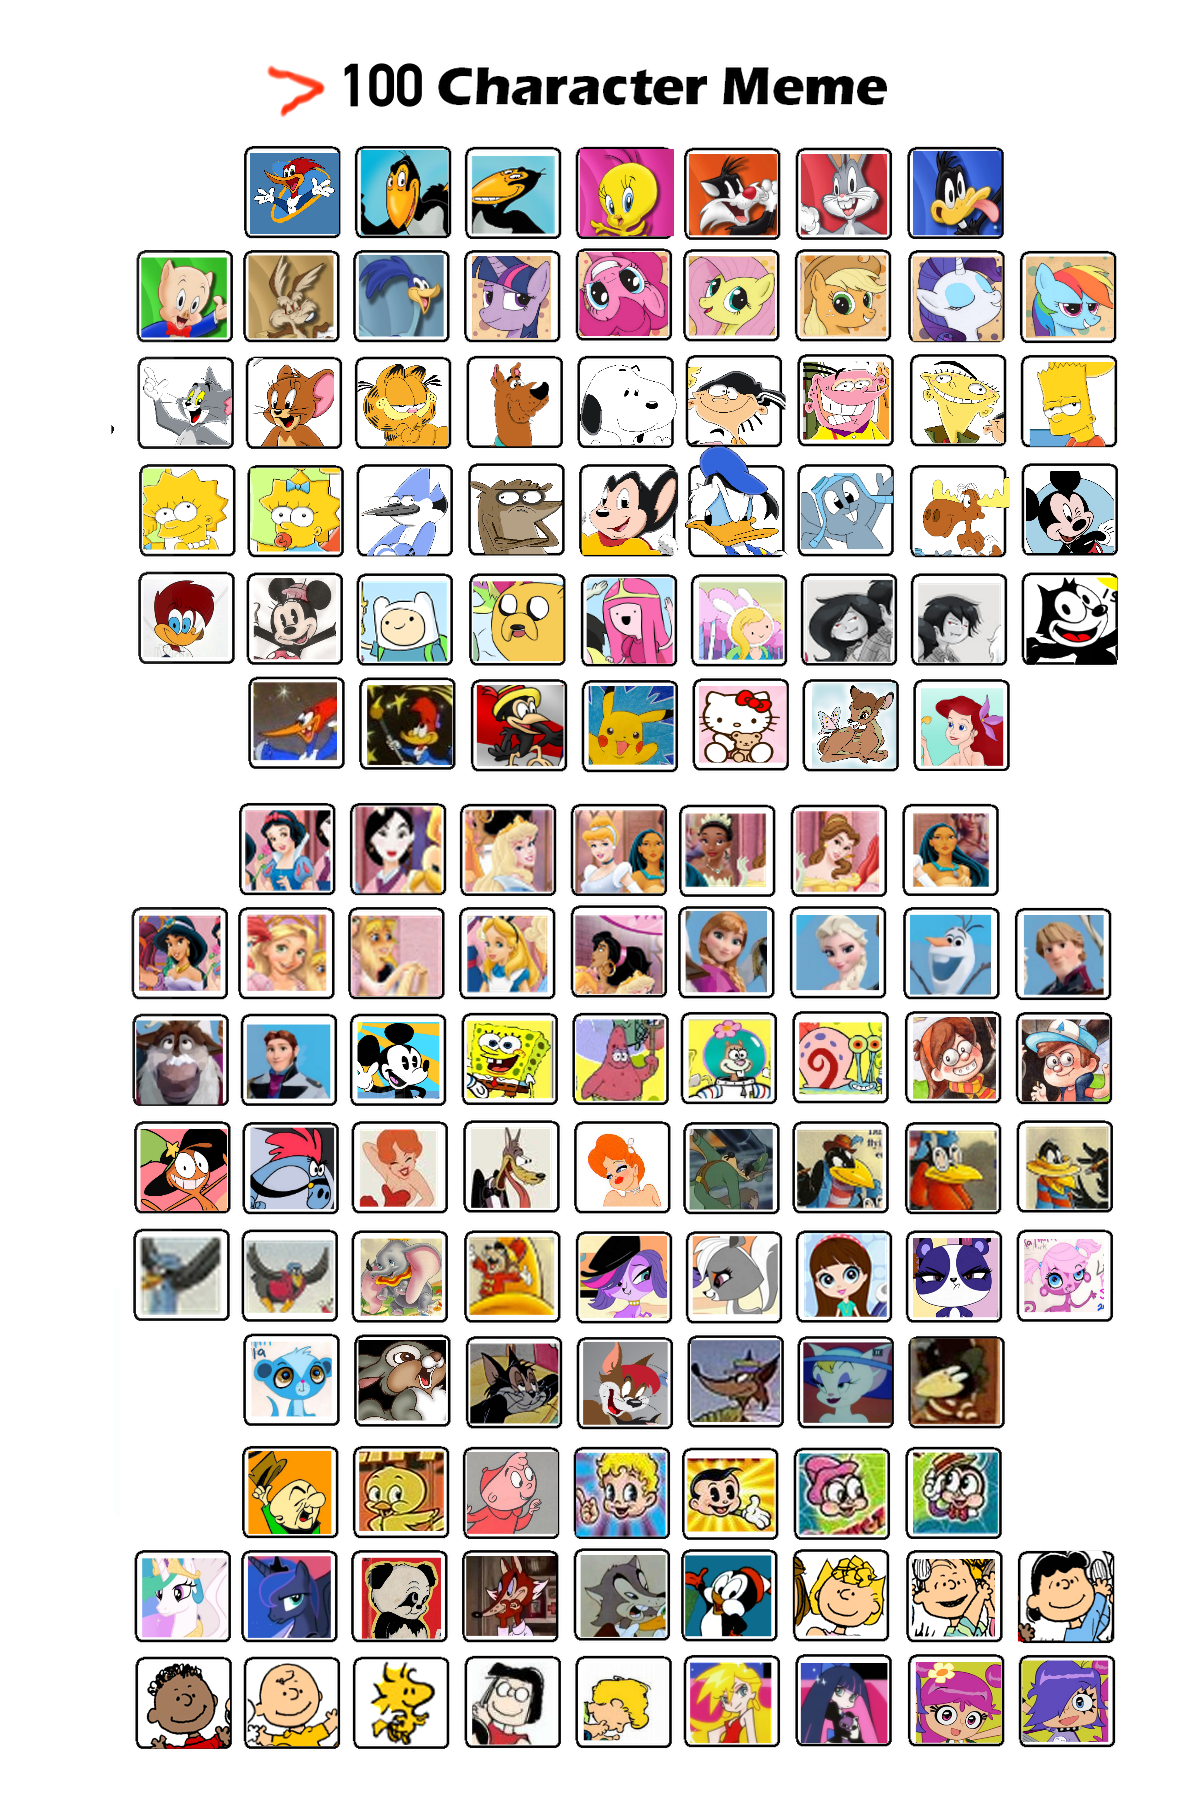 100 Pictures Cartoon Characters 125 cartoon character memesweetaerobaby87 on deviantart